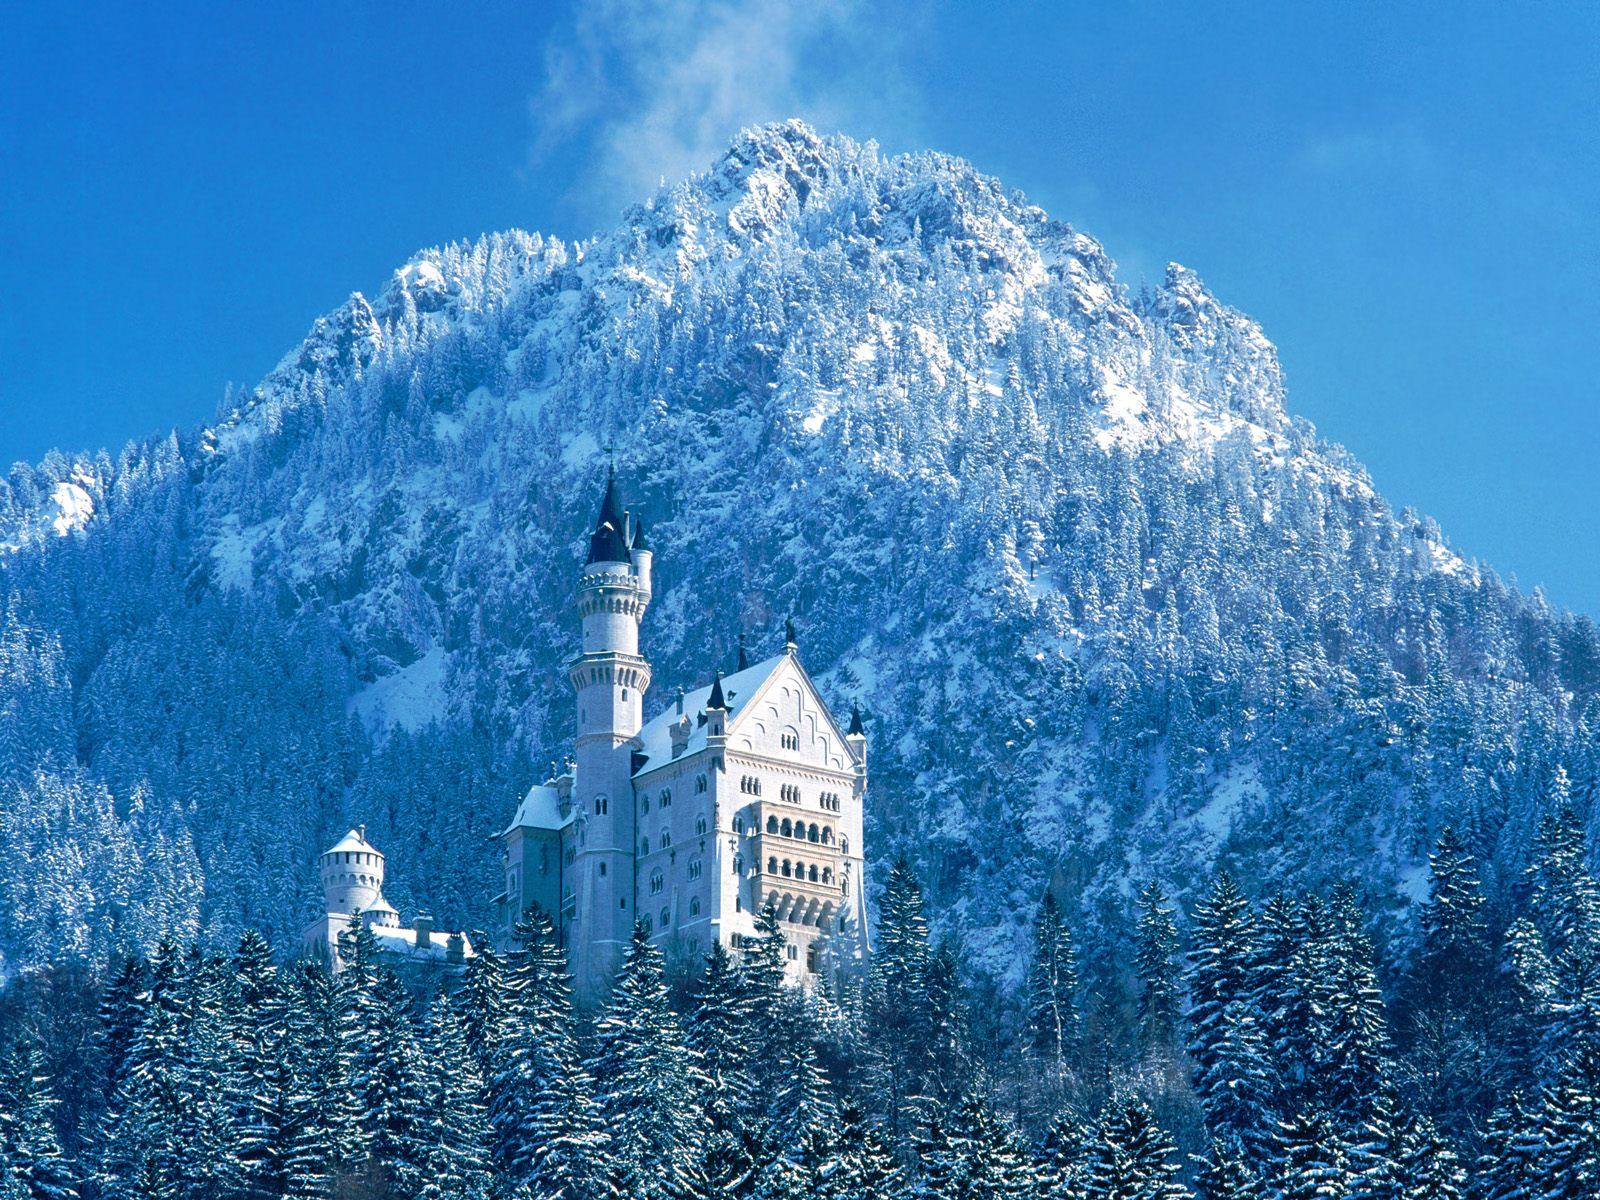 Neuschwanstein Castle Bavaria Germany - snow photo or wallpaper